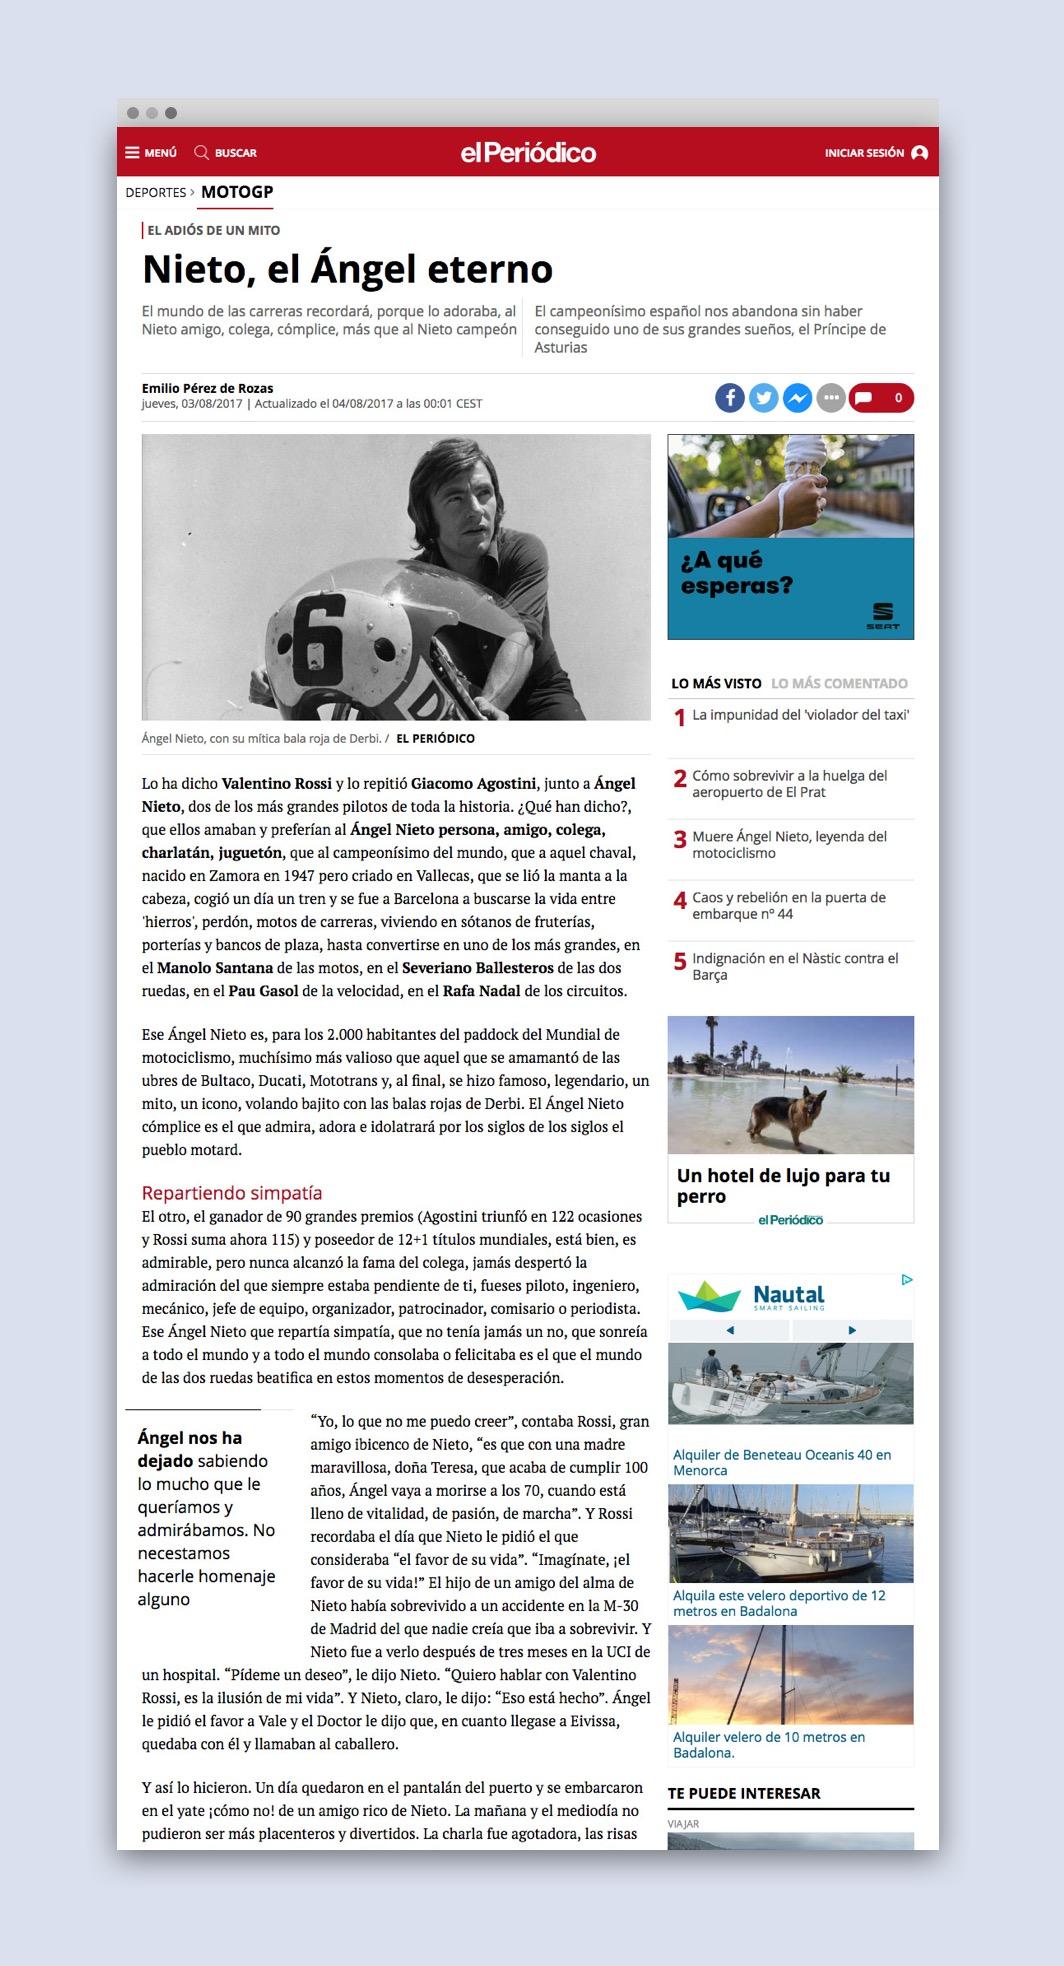 Article a la web d'El Periodico